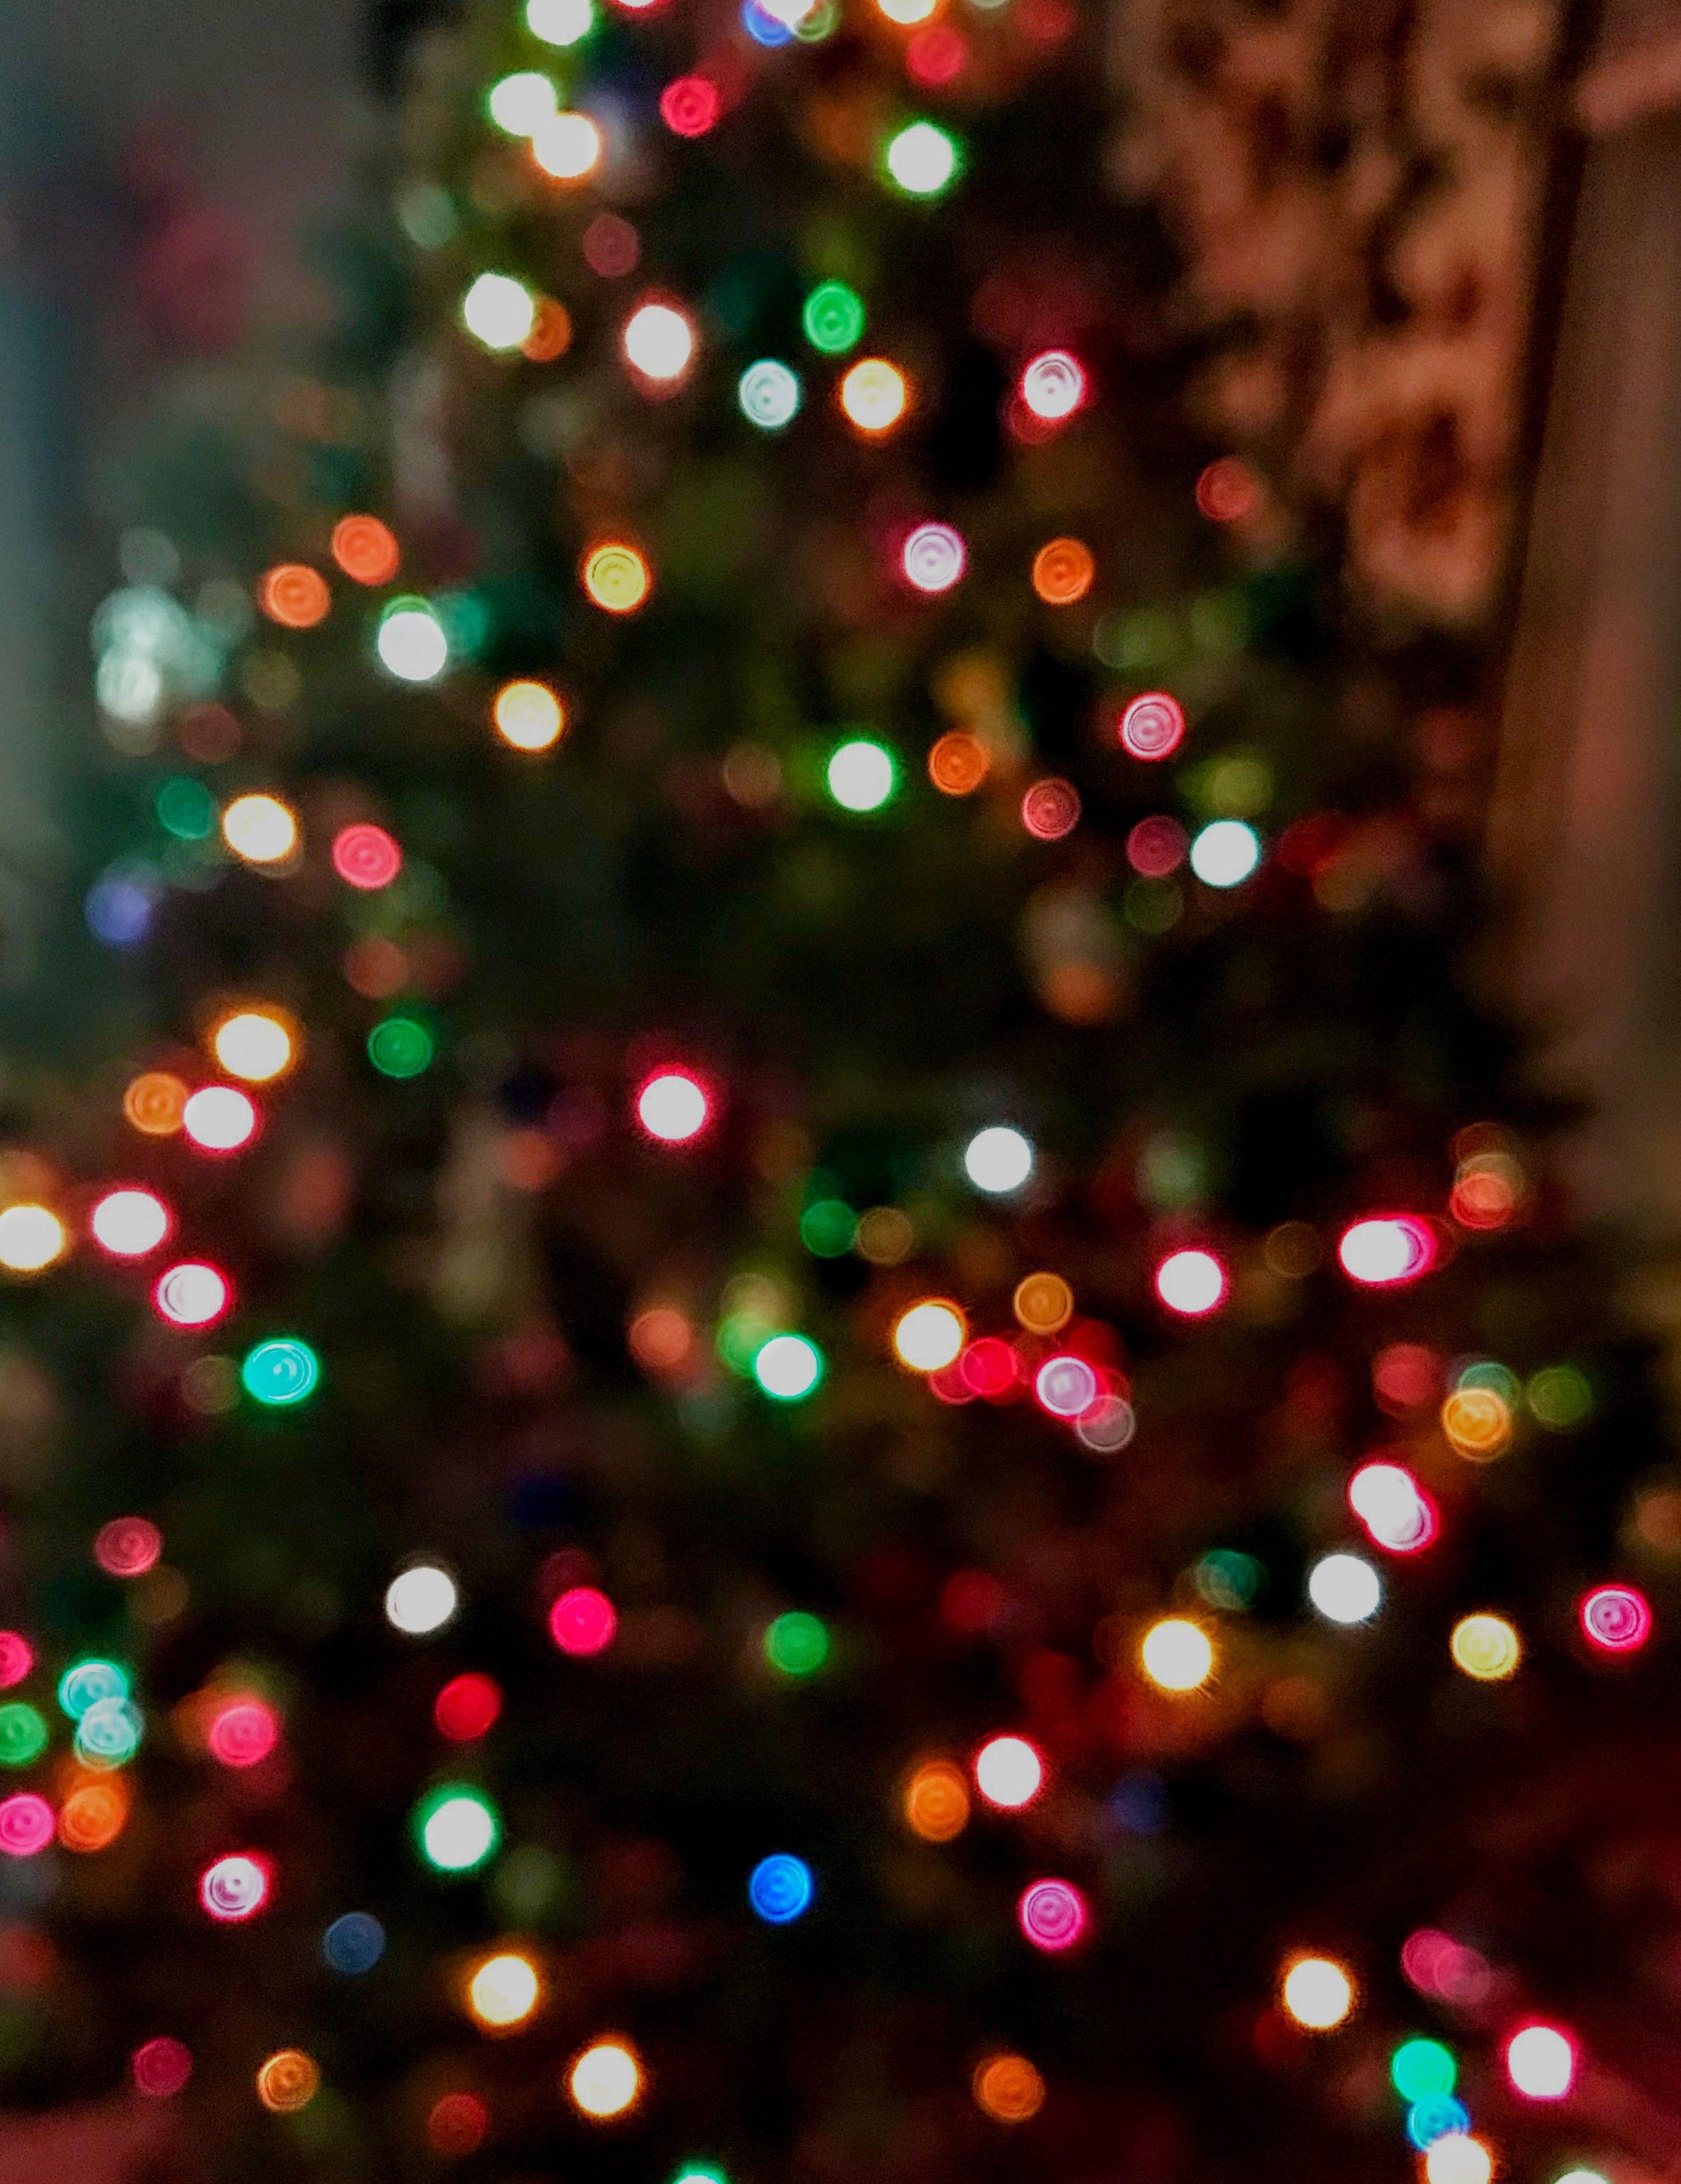 Cozy Winter Night, Christmas Aesthetic, Home Appreciation Photography, An Original